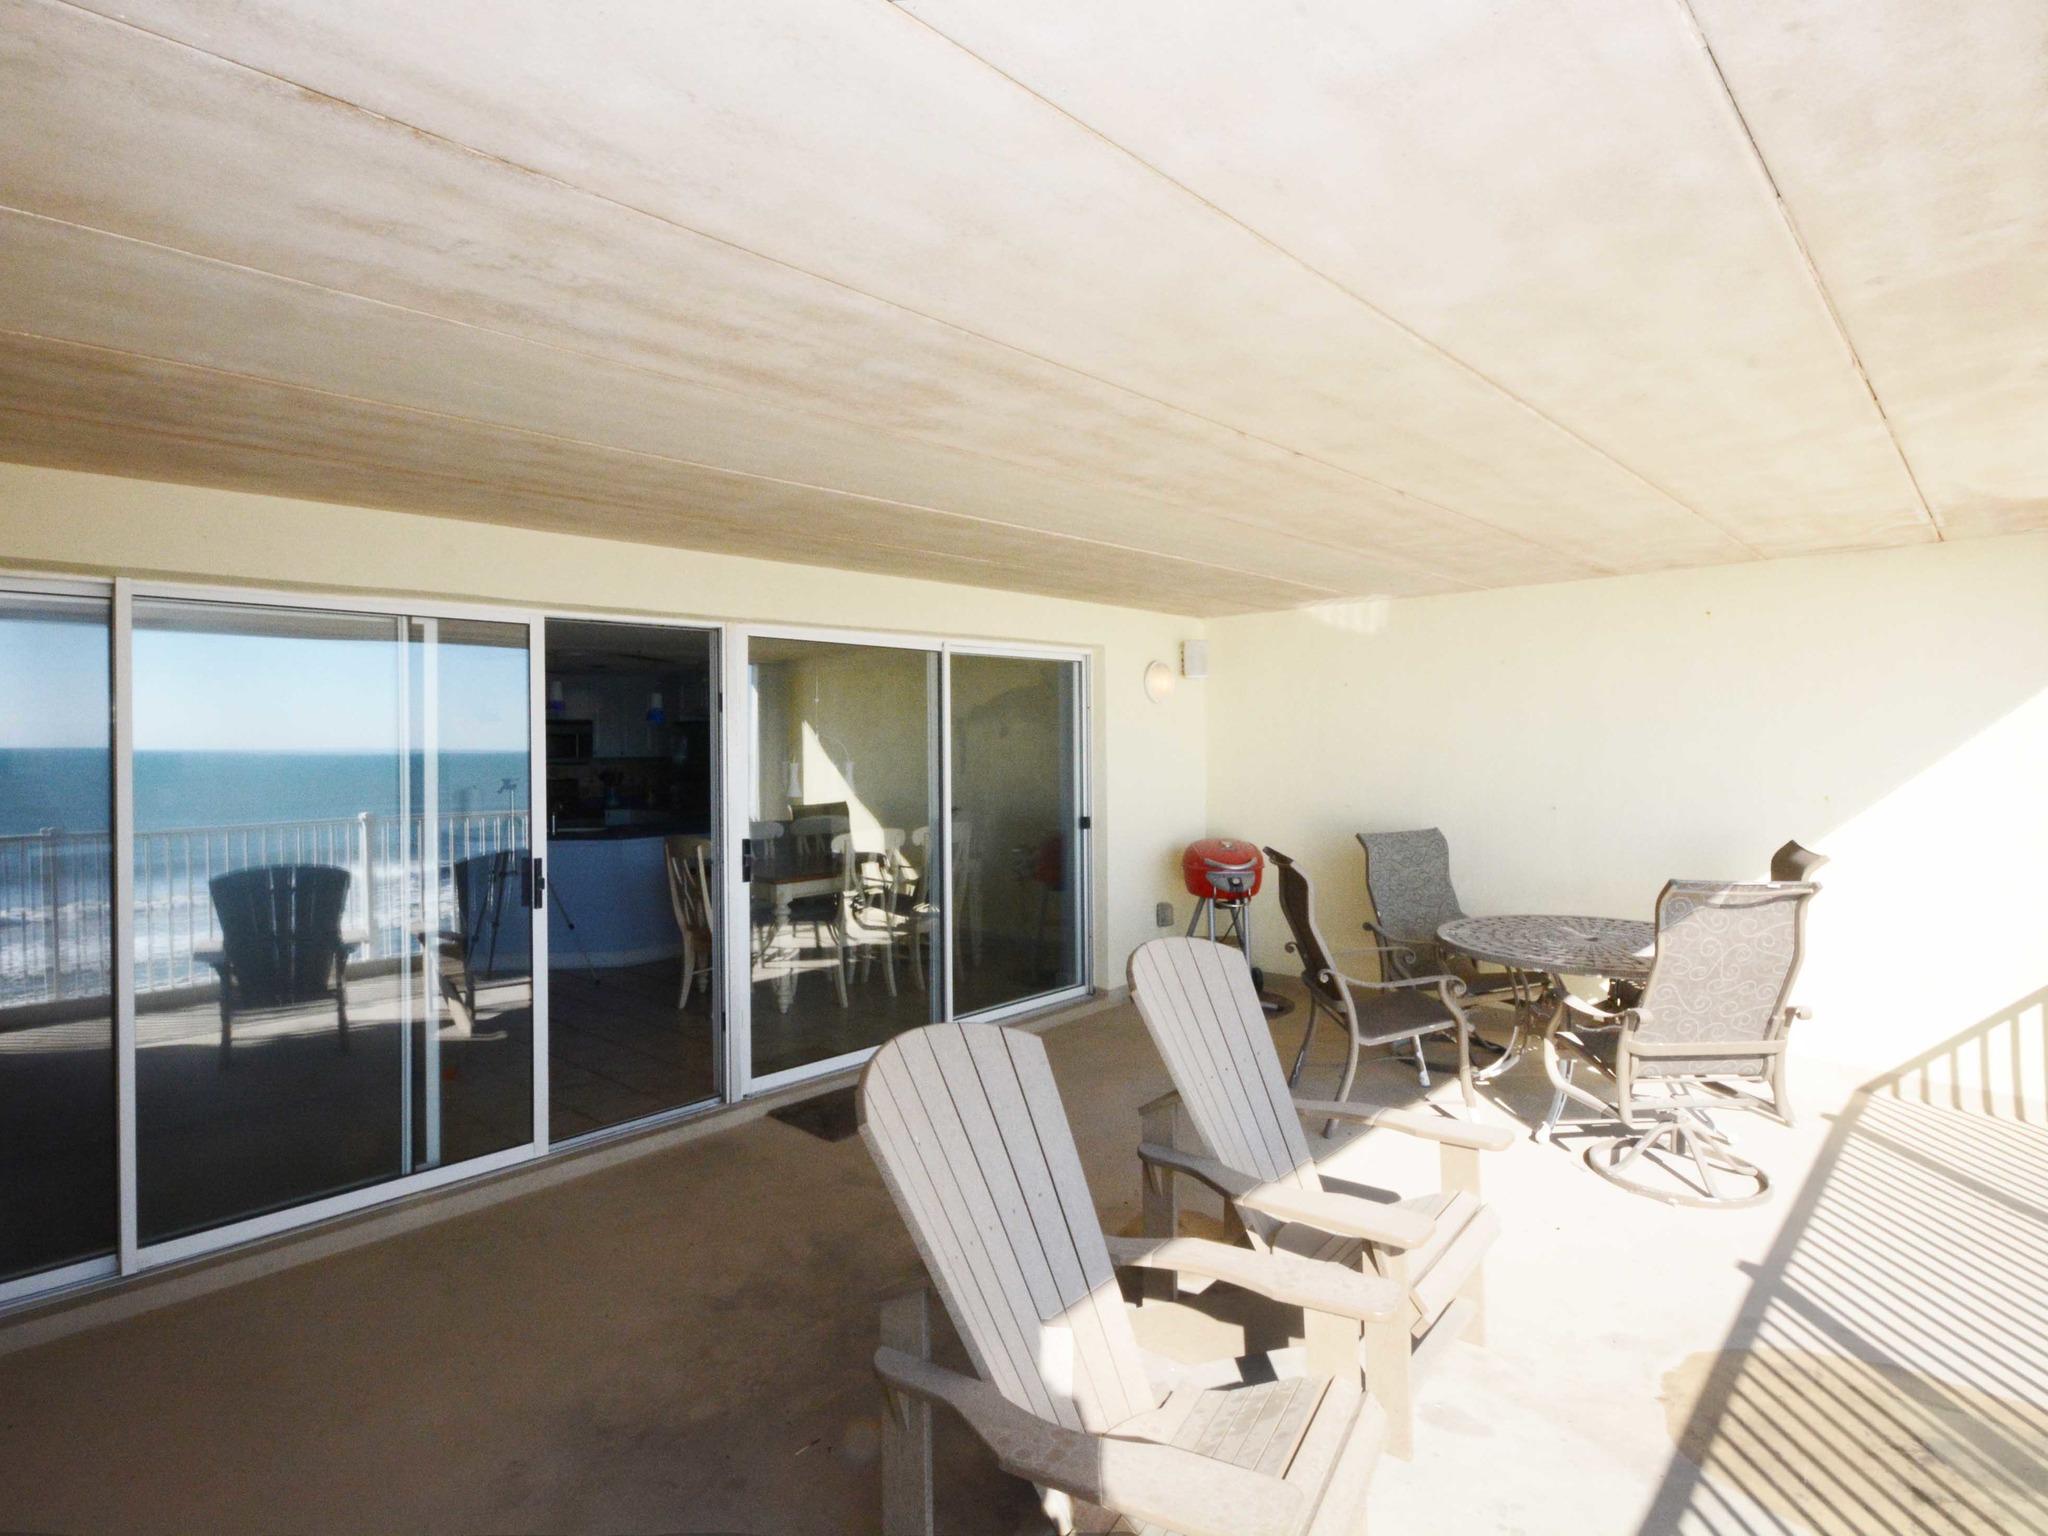 Calypso 505 2 bedroom home ocean city md vacation - 2 bedroom suites in ocean city md ...